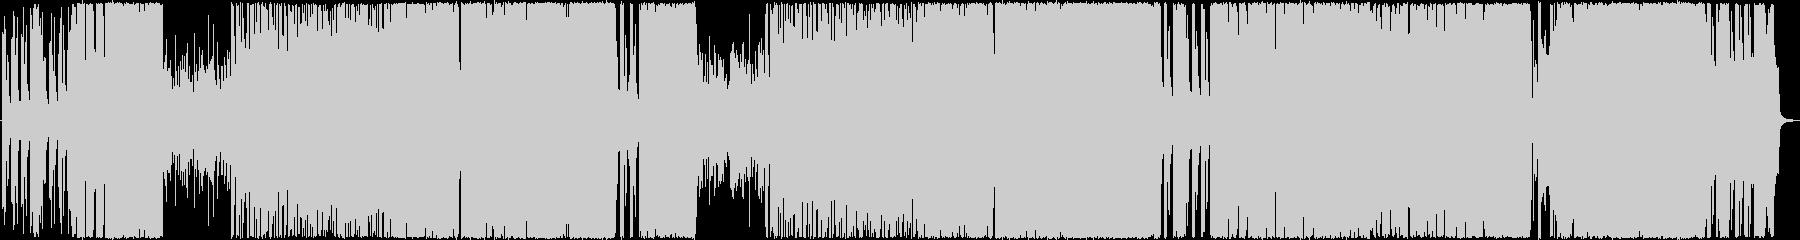 Chiru Hanaシンフォニックメタルの未再生の波形